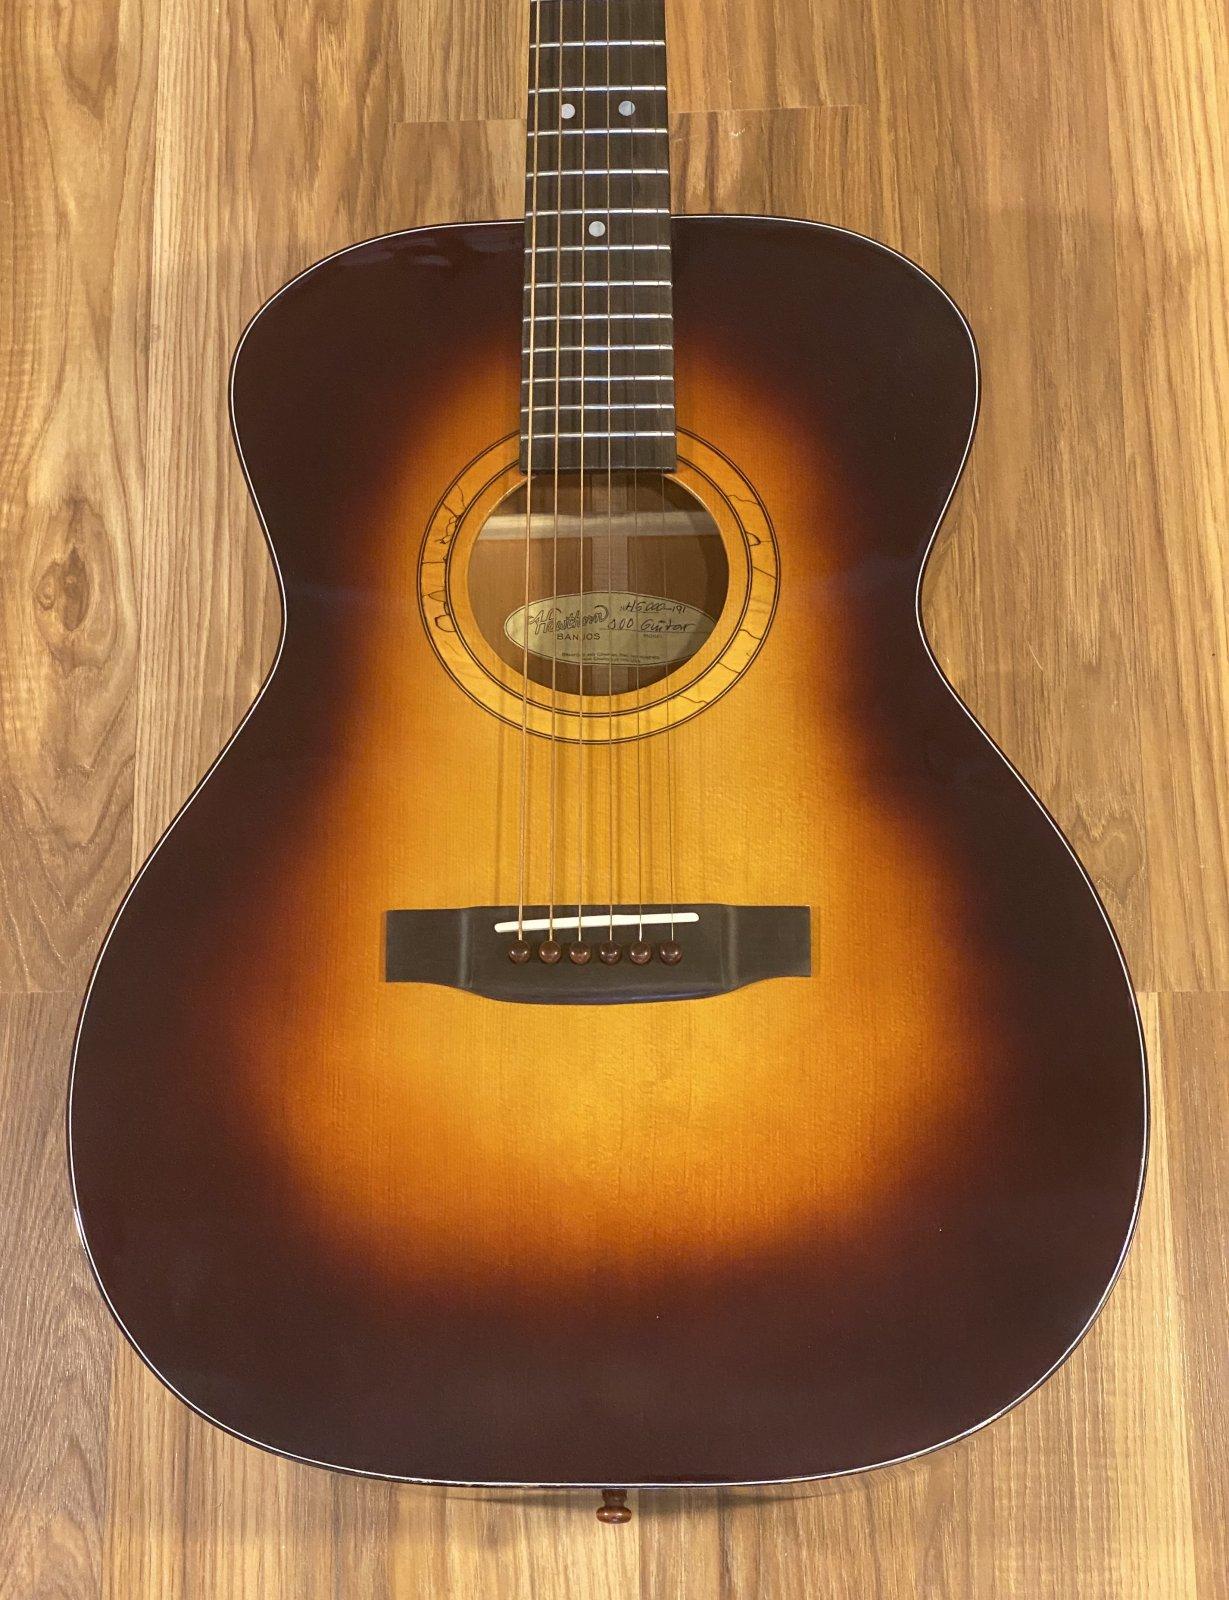 Hawthorn 000 Acoustic Guitar Sitka/Mahogany Sunburst